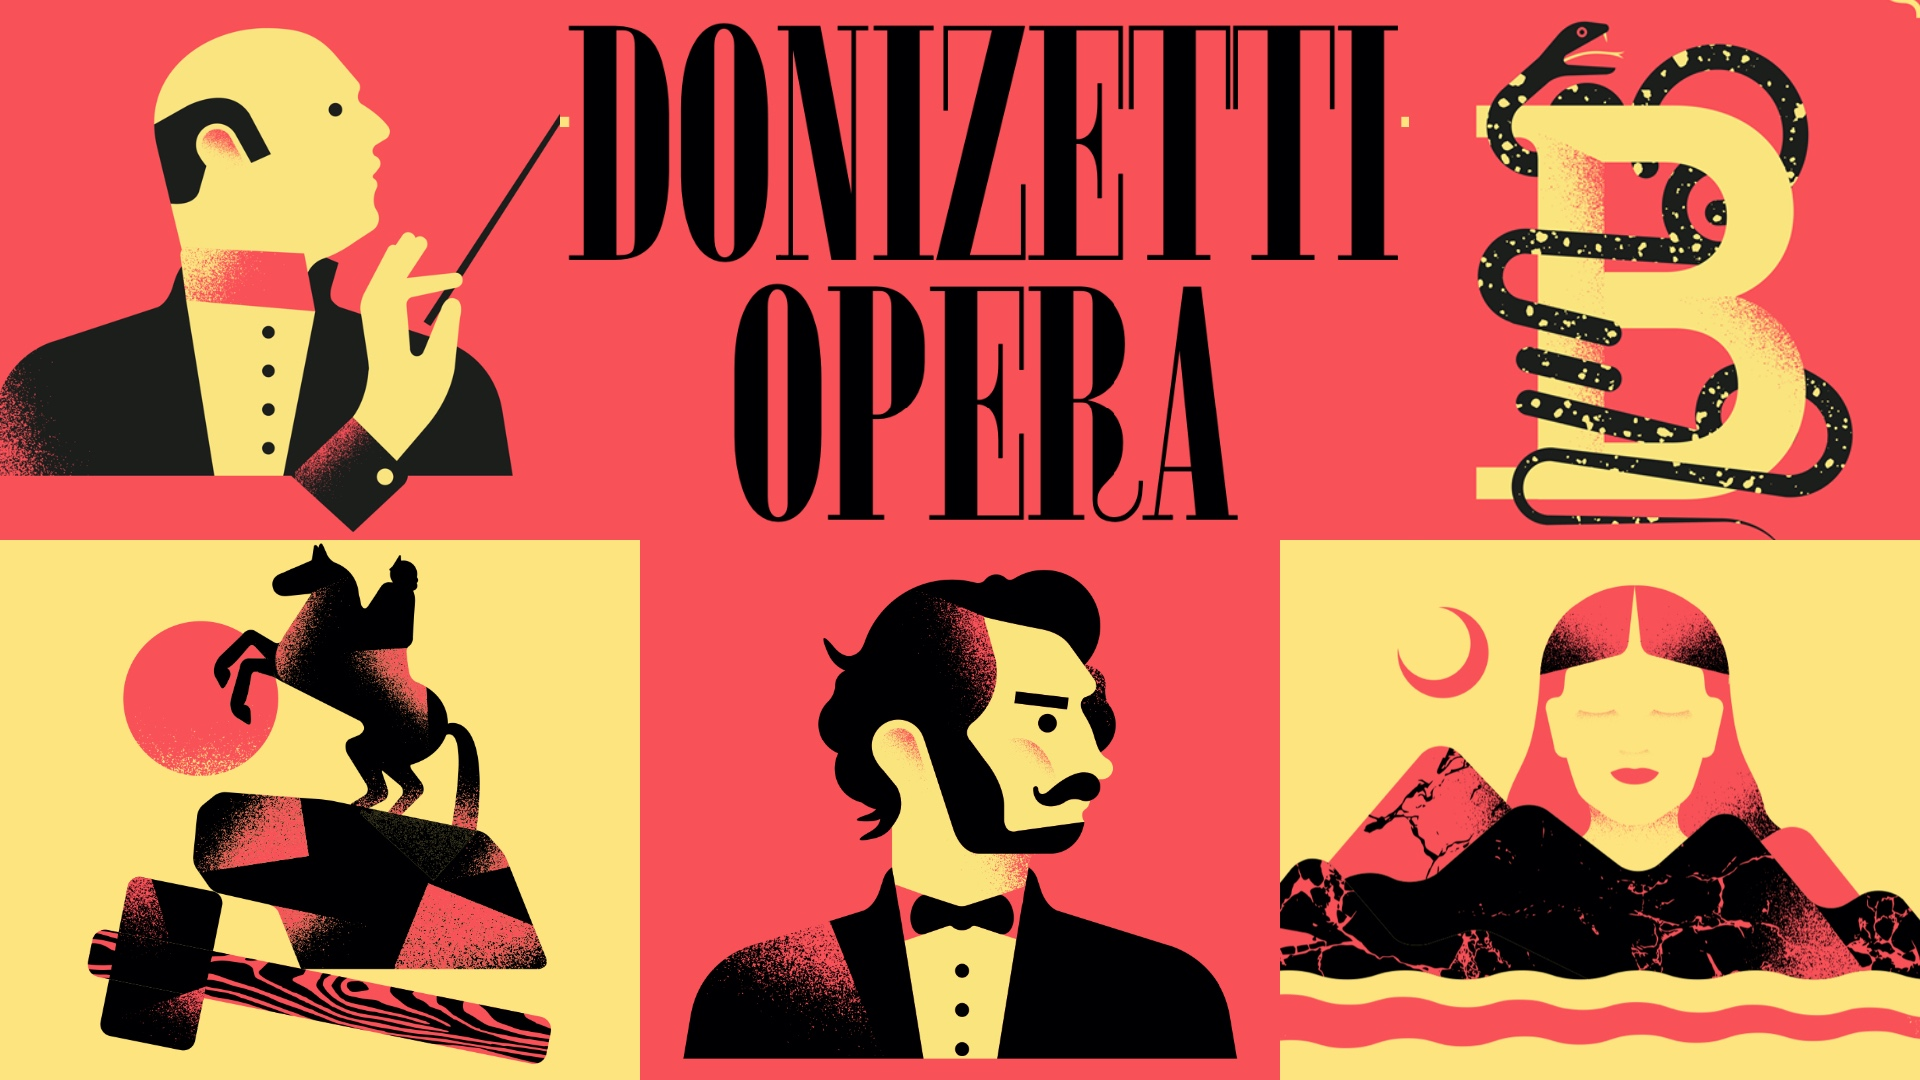 Donizetti Opera 2019 - Bergamo